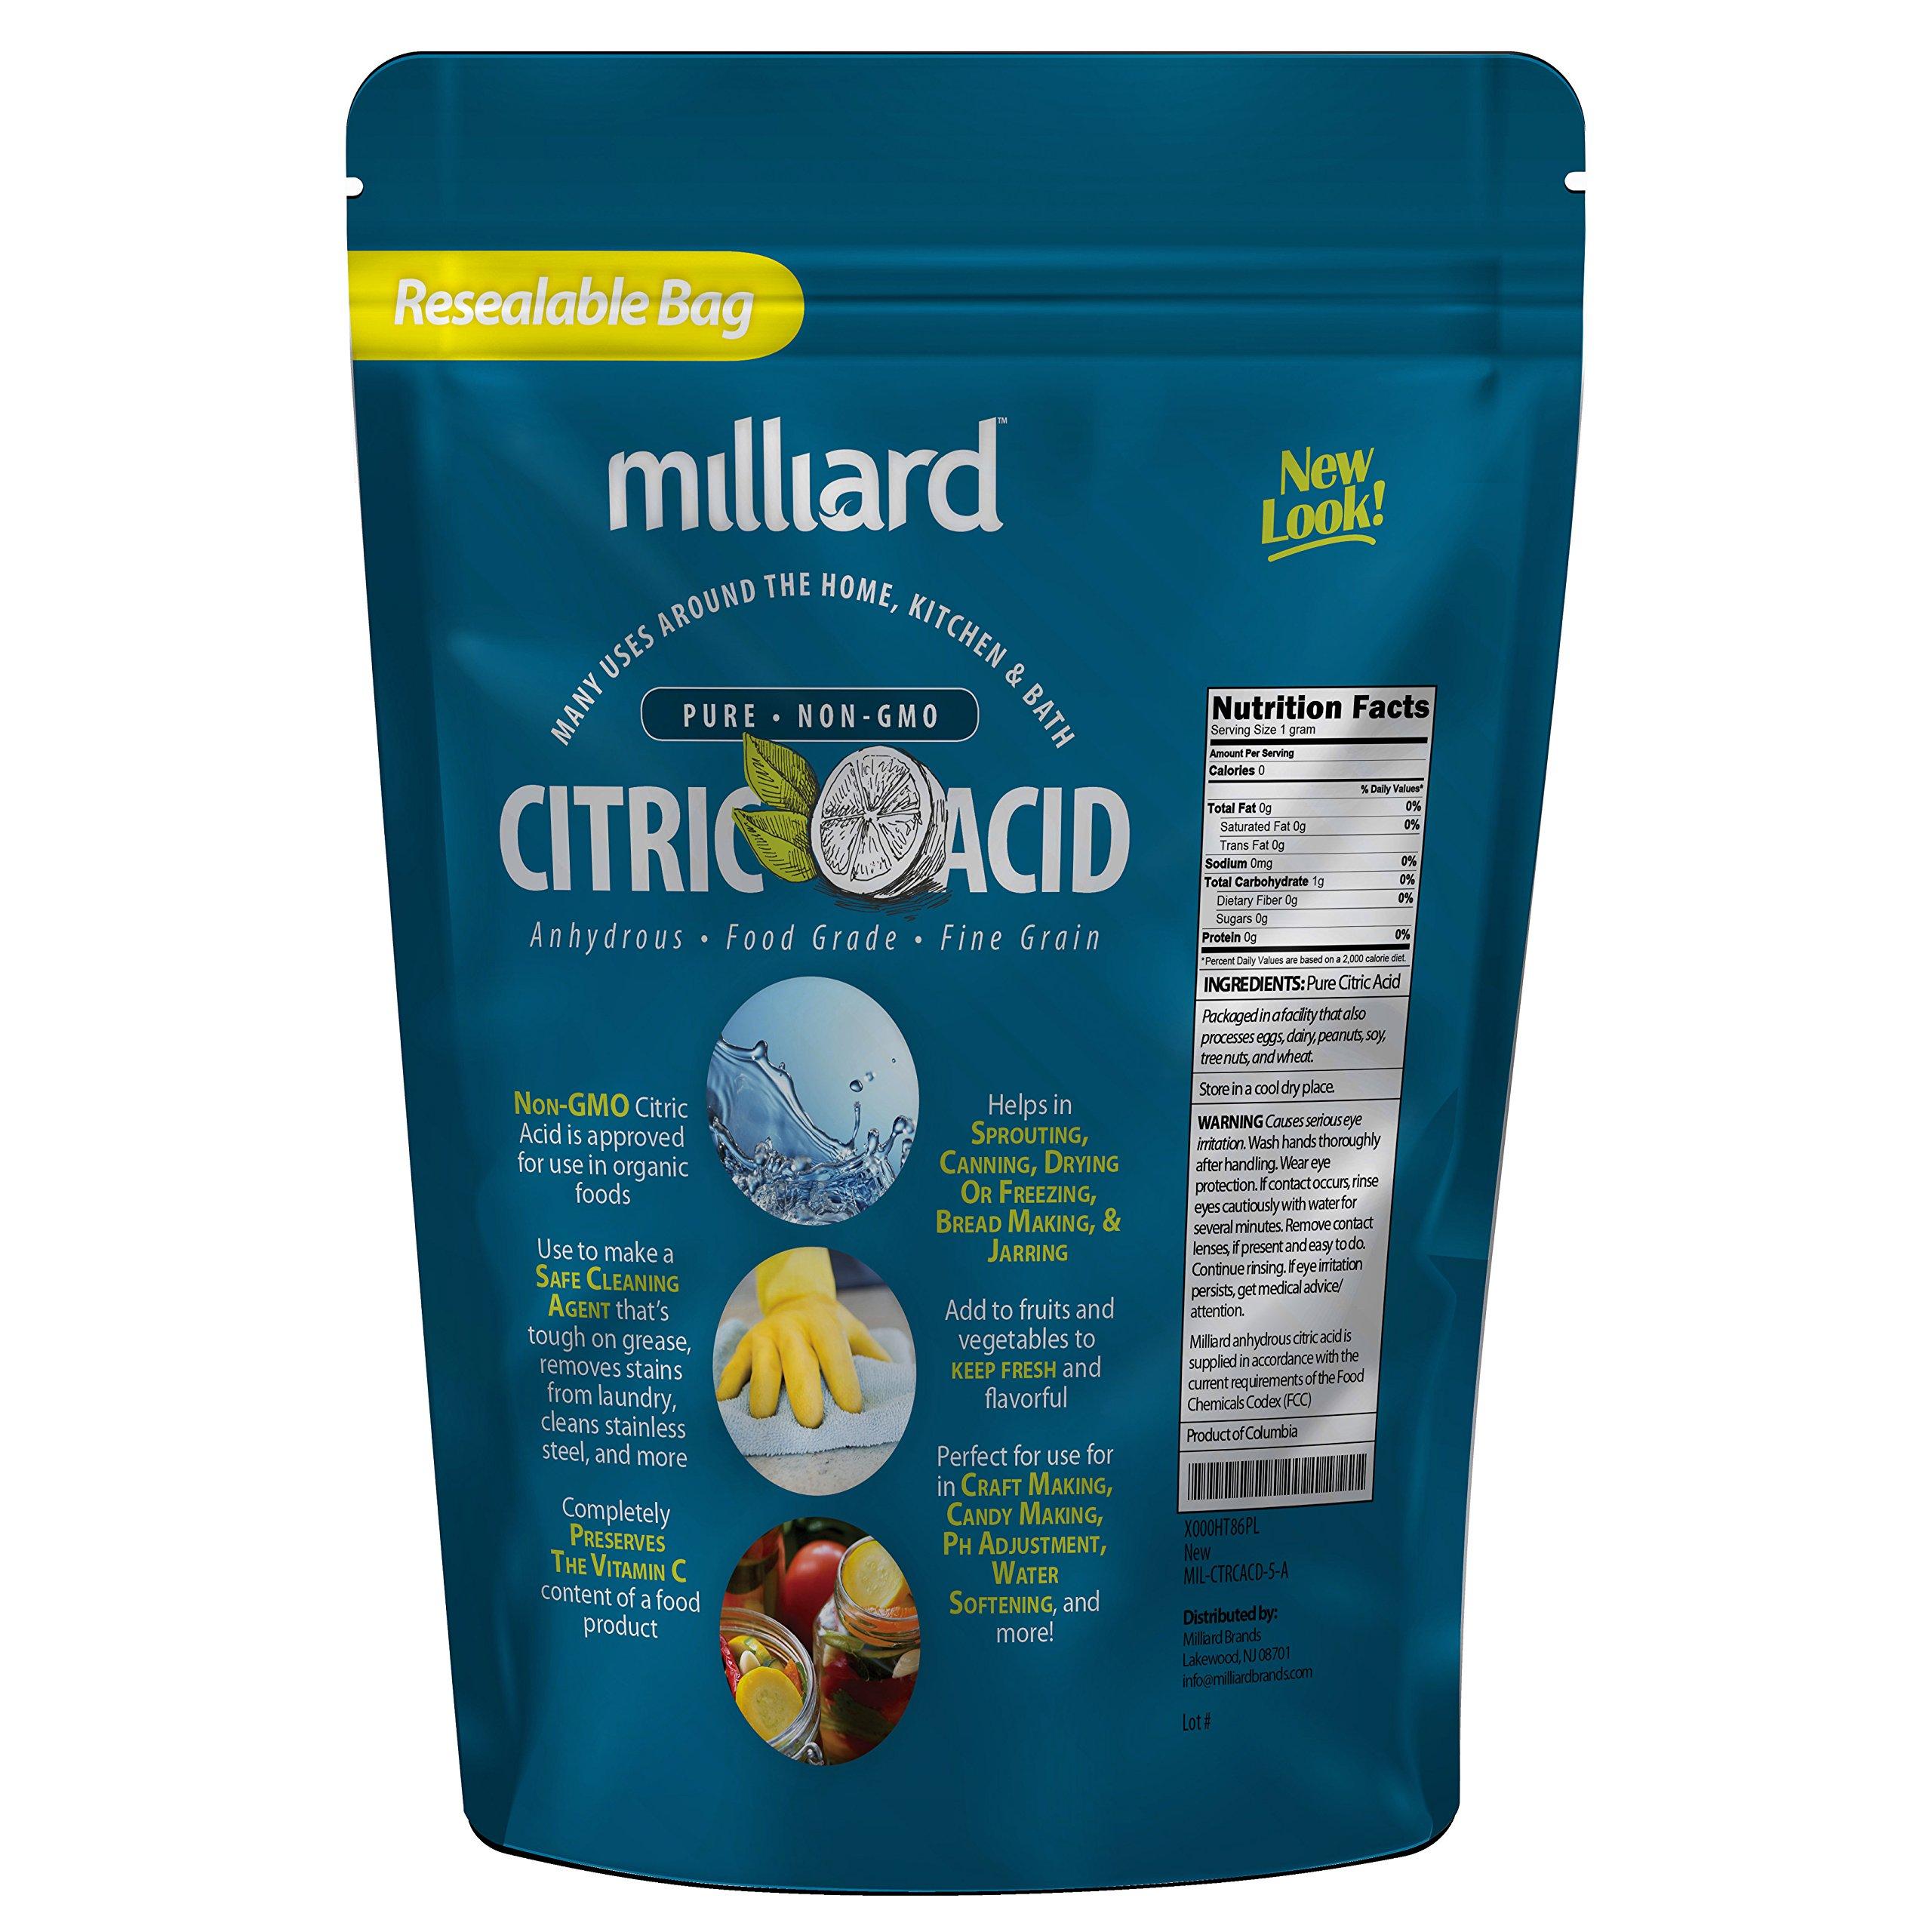 Milliard Citric Acid 5 Pound - 100% Pure Food Grade NON-GMO Project VERIFIED (5 Pound) by Milliard (Image #7)